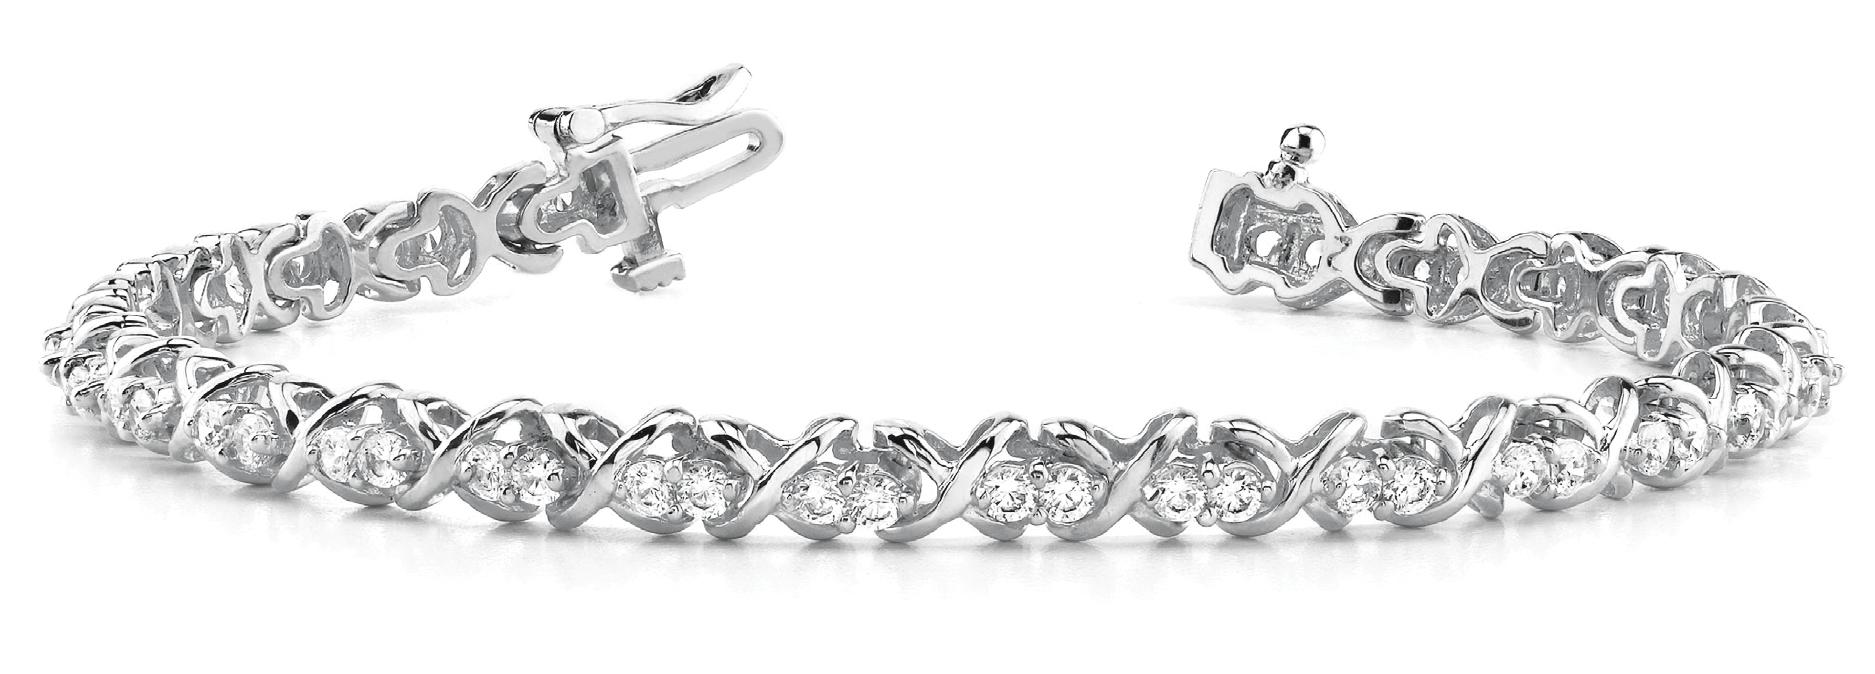 1 1/4 ct tw 14kt gold<br> White Bracelet 56 -<br> .022PT Round